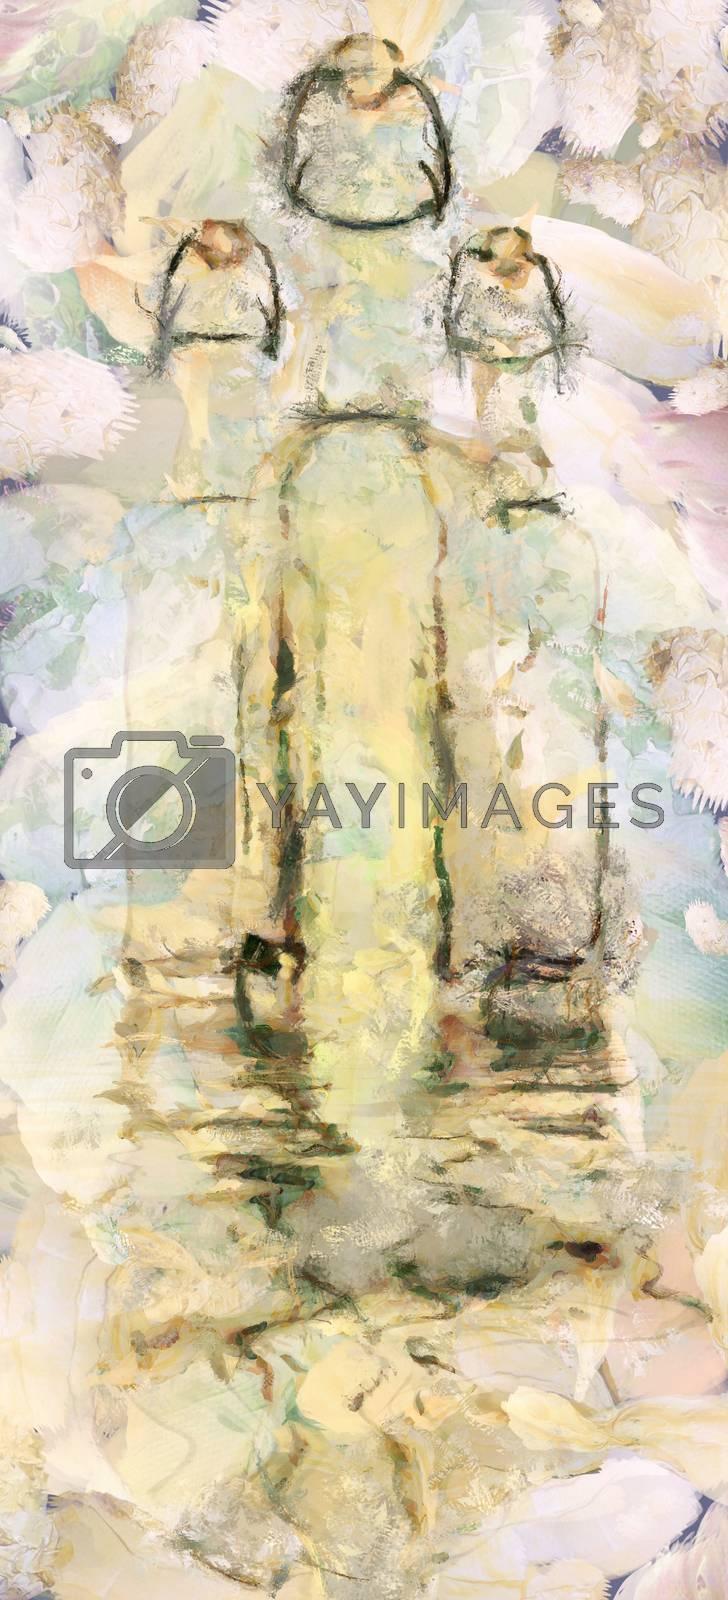 Modern art. Three glass bottles reflects in water.